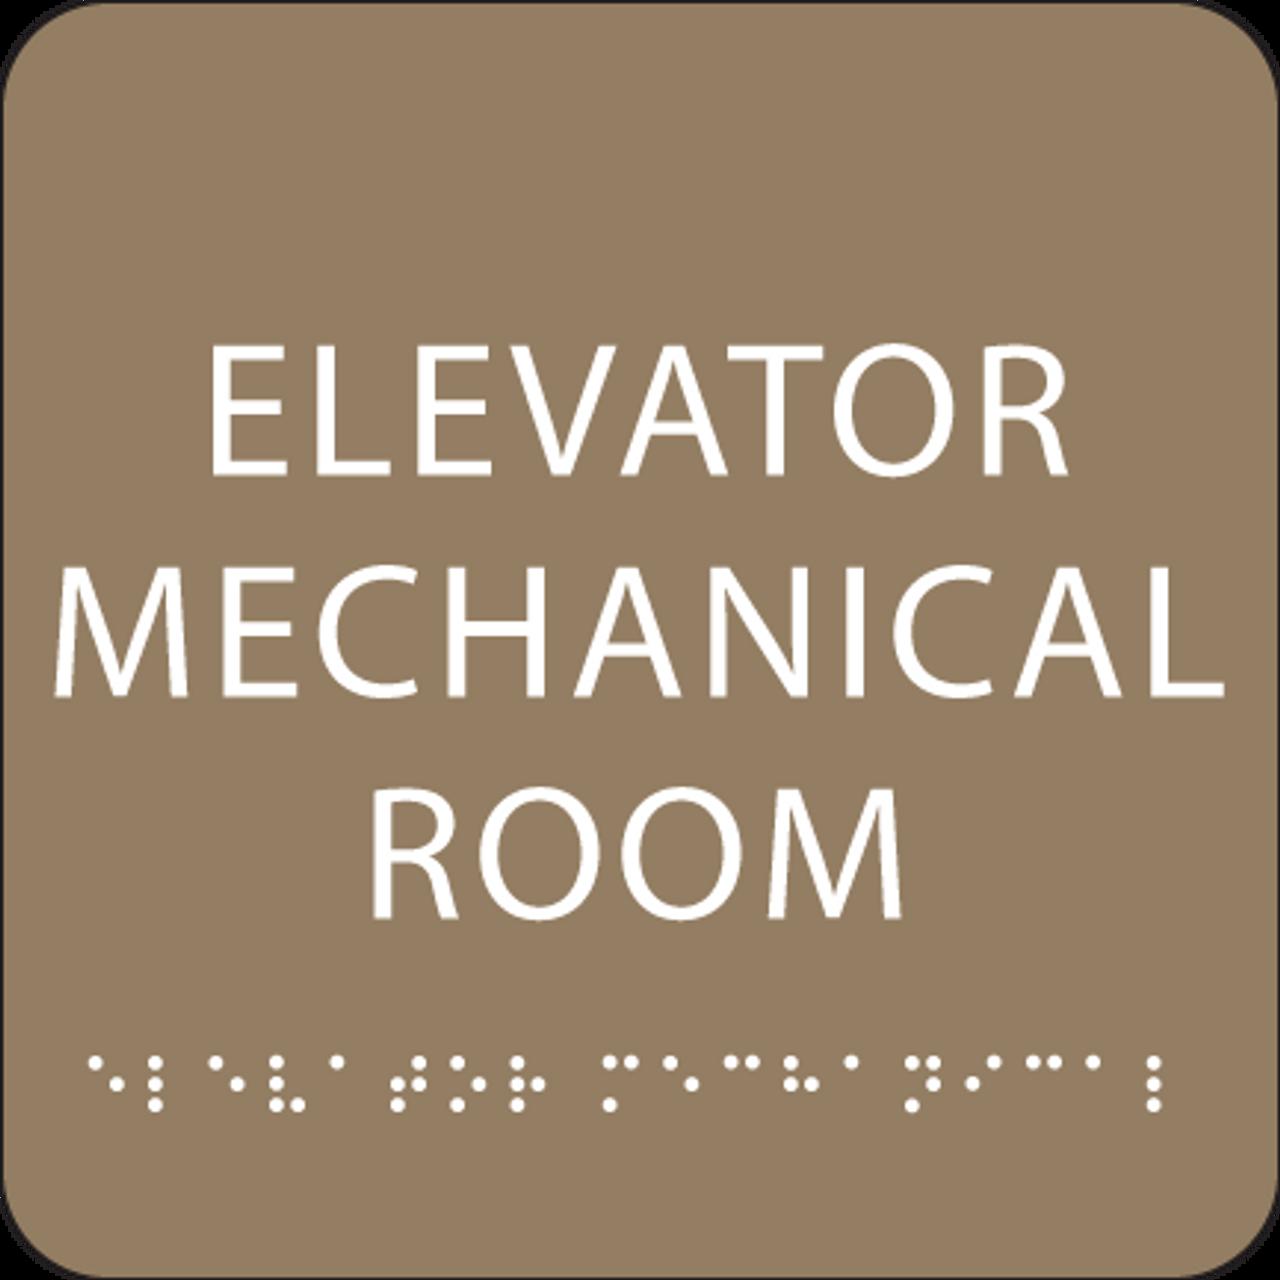 Light Brown Elevator Mechanical Room Braille Sign